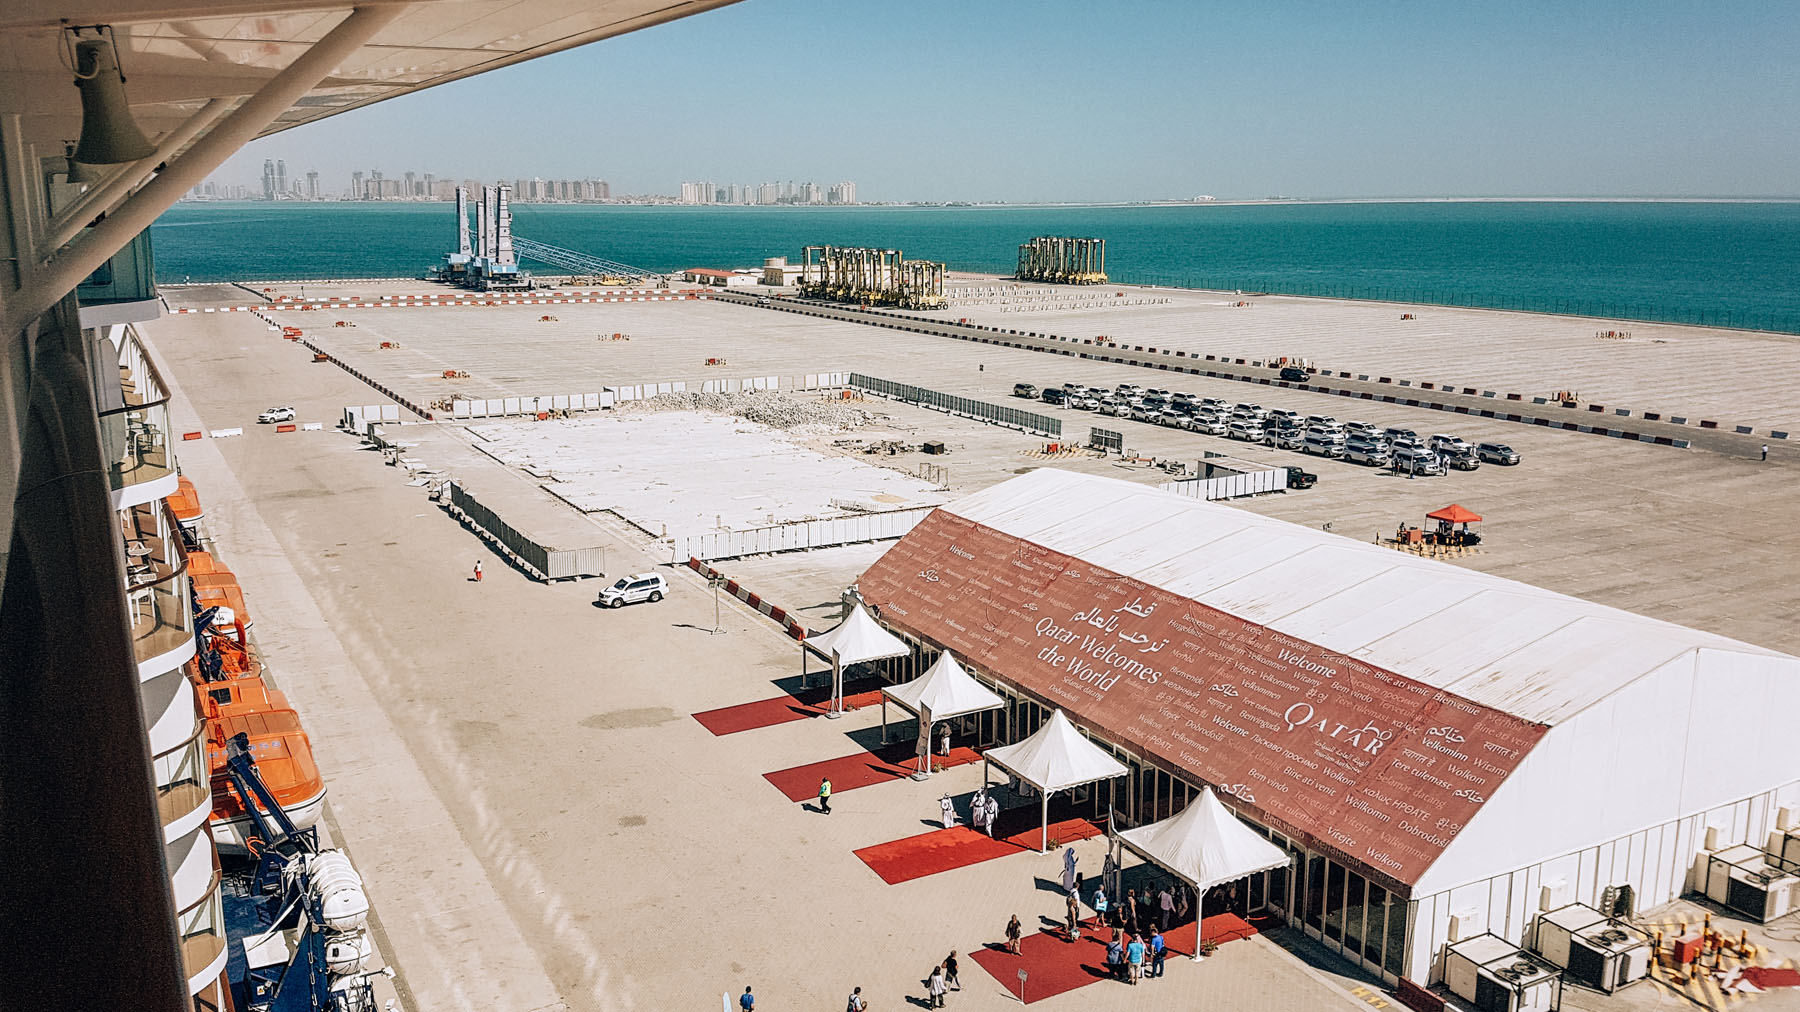 Orient Kreuzfahrt Doha Katar Hafen